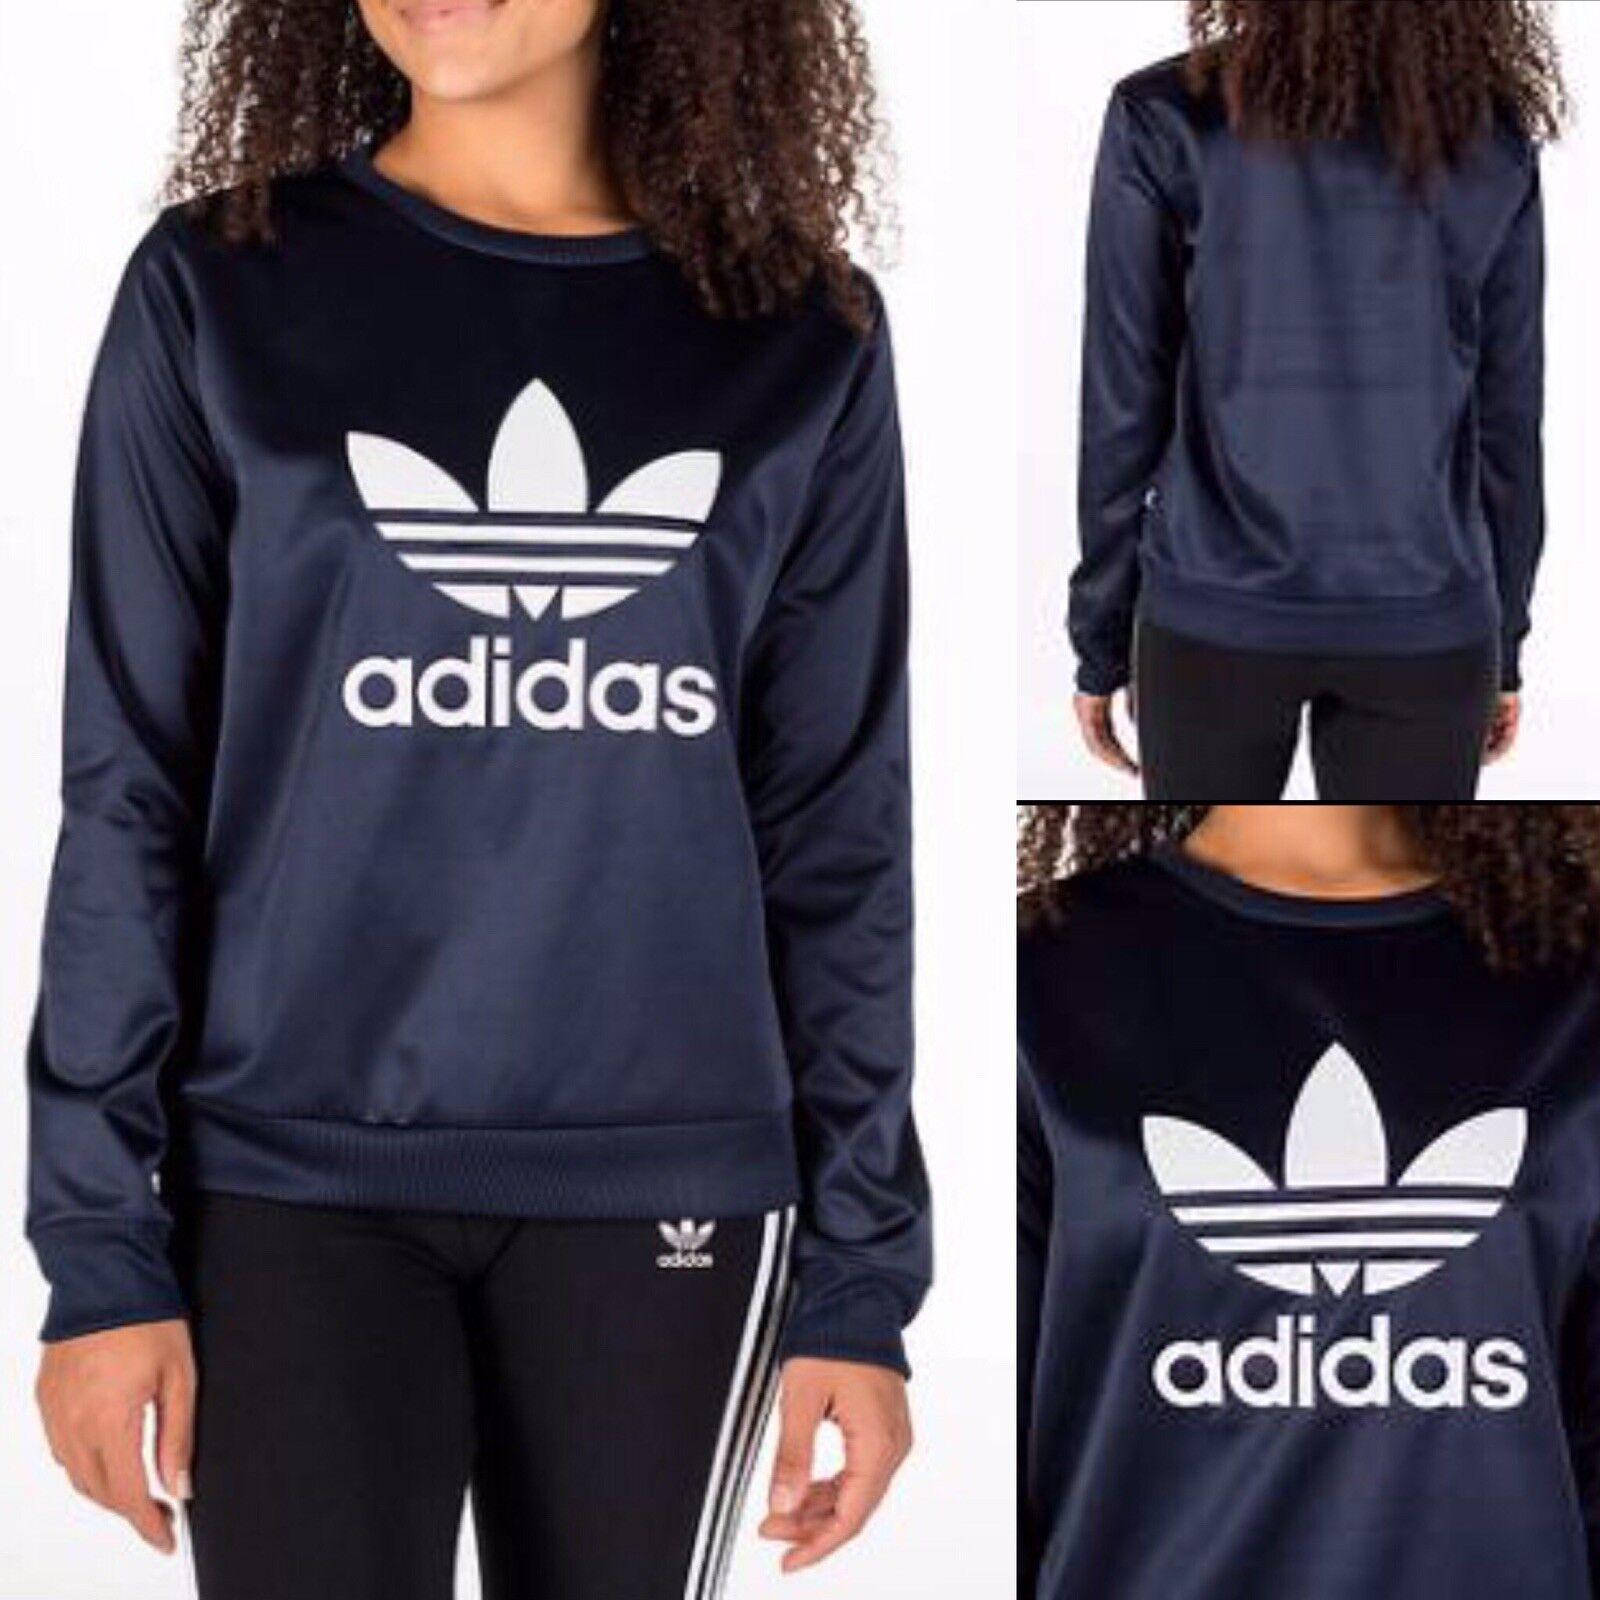 Adidas Originals Trefoil Satin Crew SweatshirtBP9387Navy Sz XS Authentic